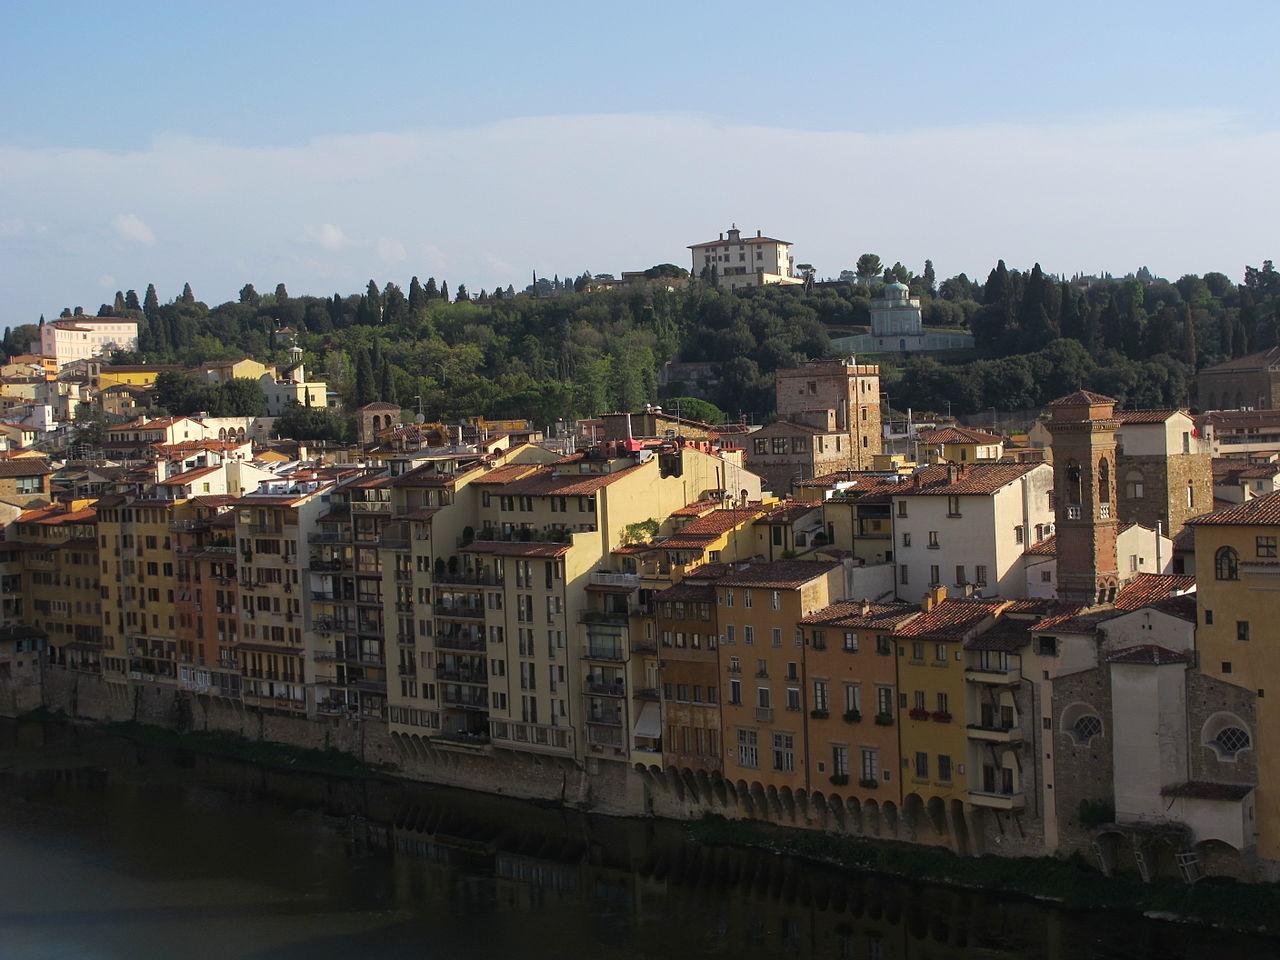 Firenze, veduta Borgo San Jacopo, Kaffeehaus (Giardino di Boboli) e Forte Belvedere